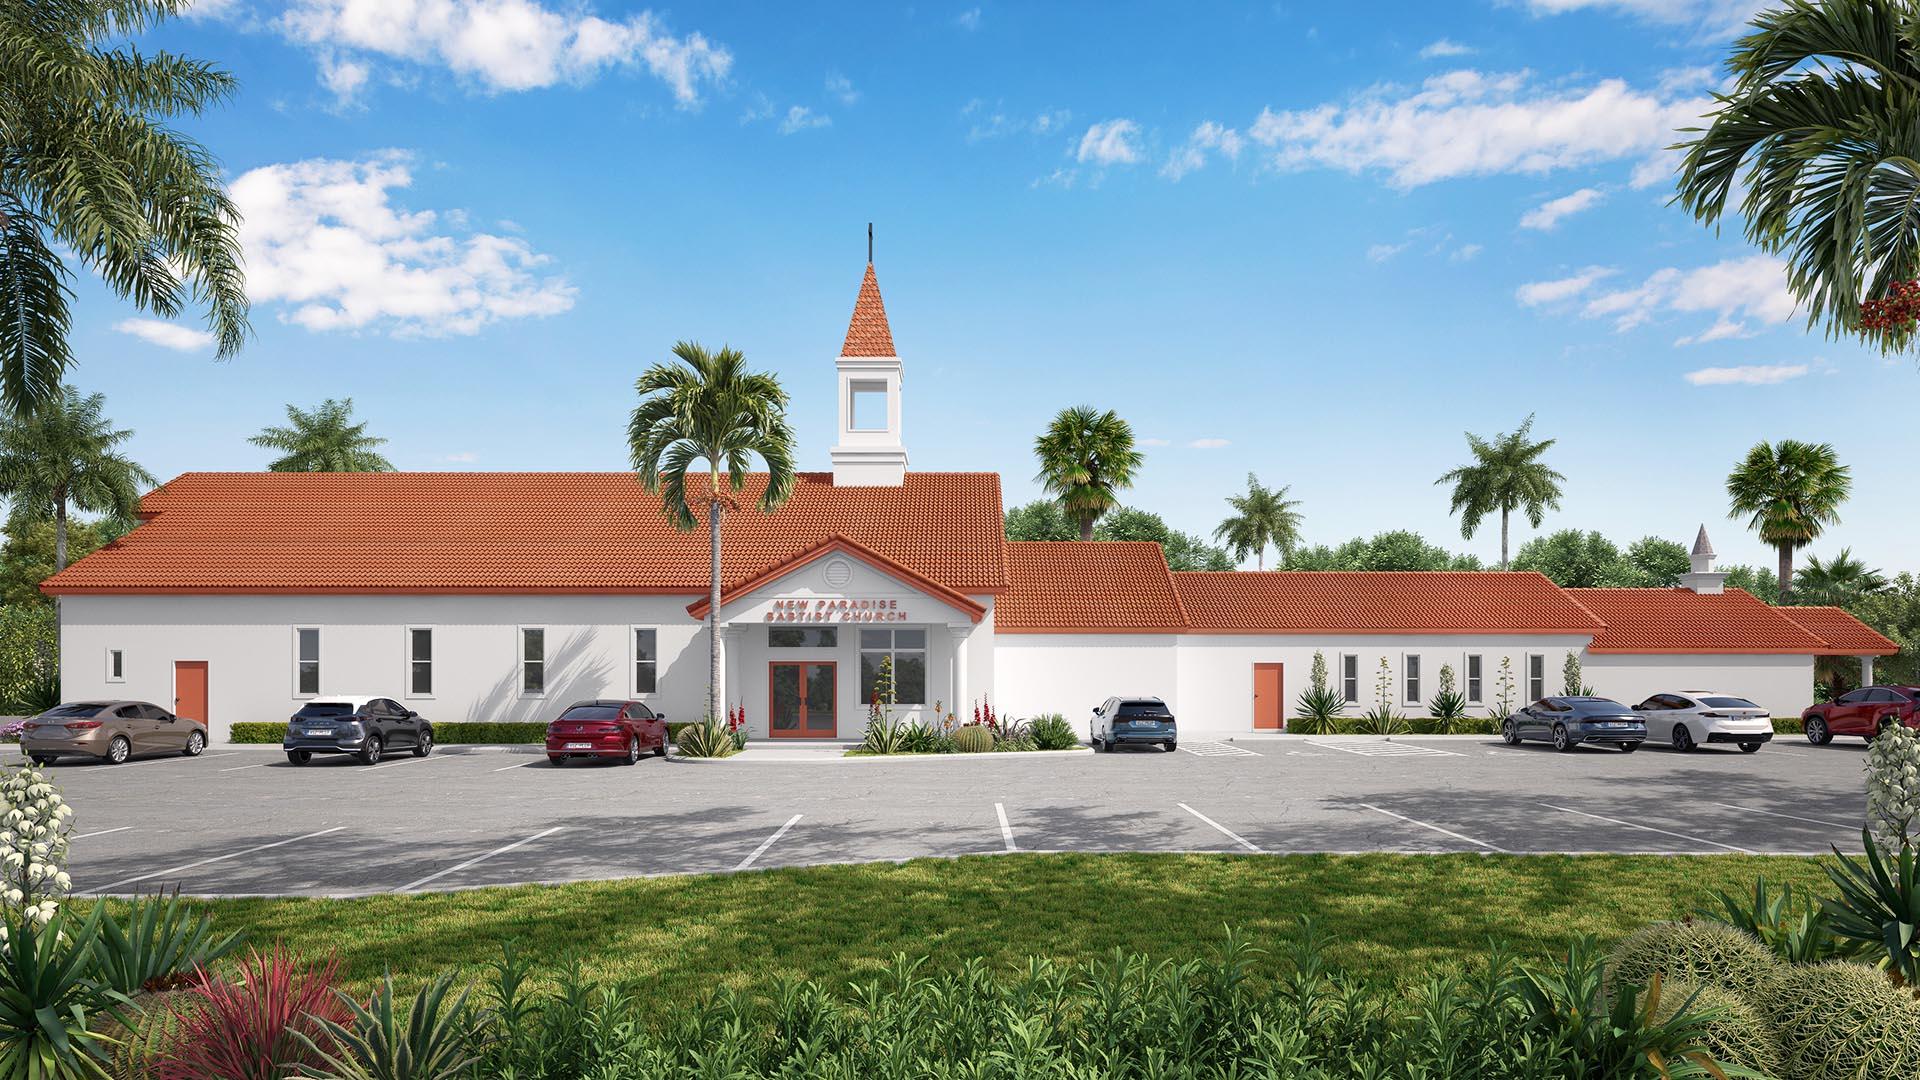 3D Render Exterior Paradise church 2